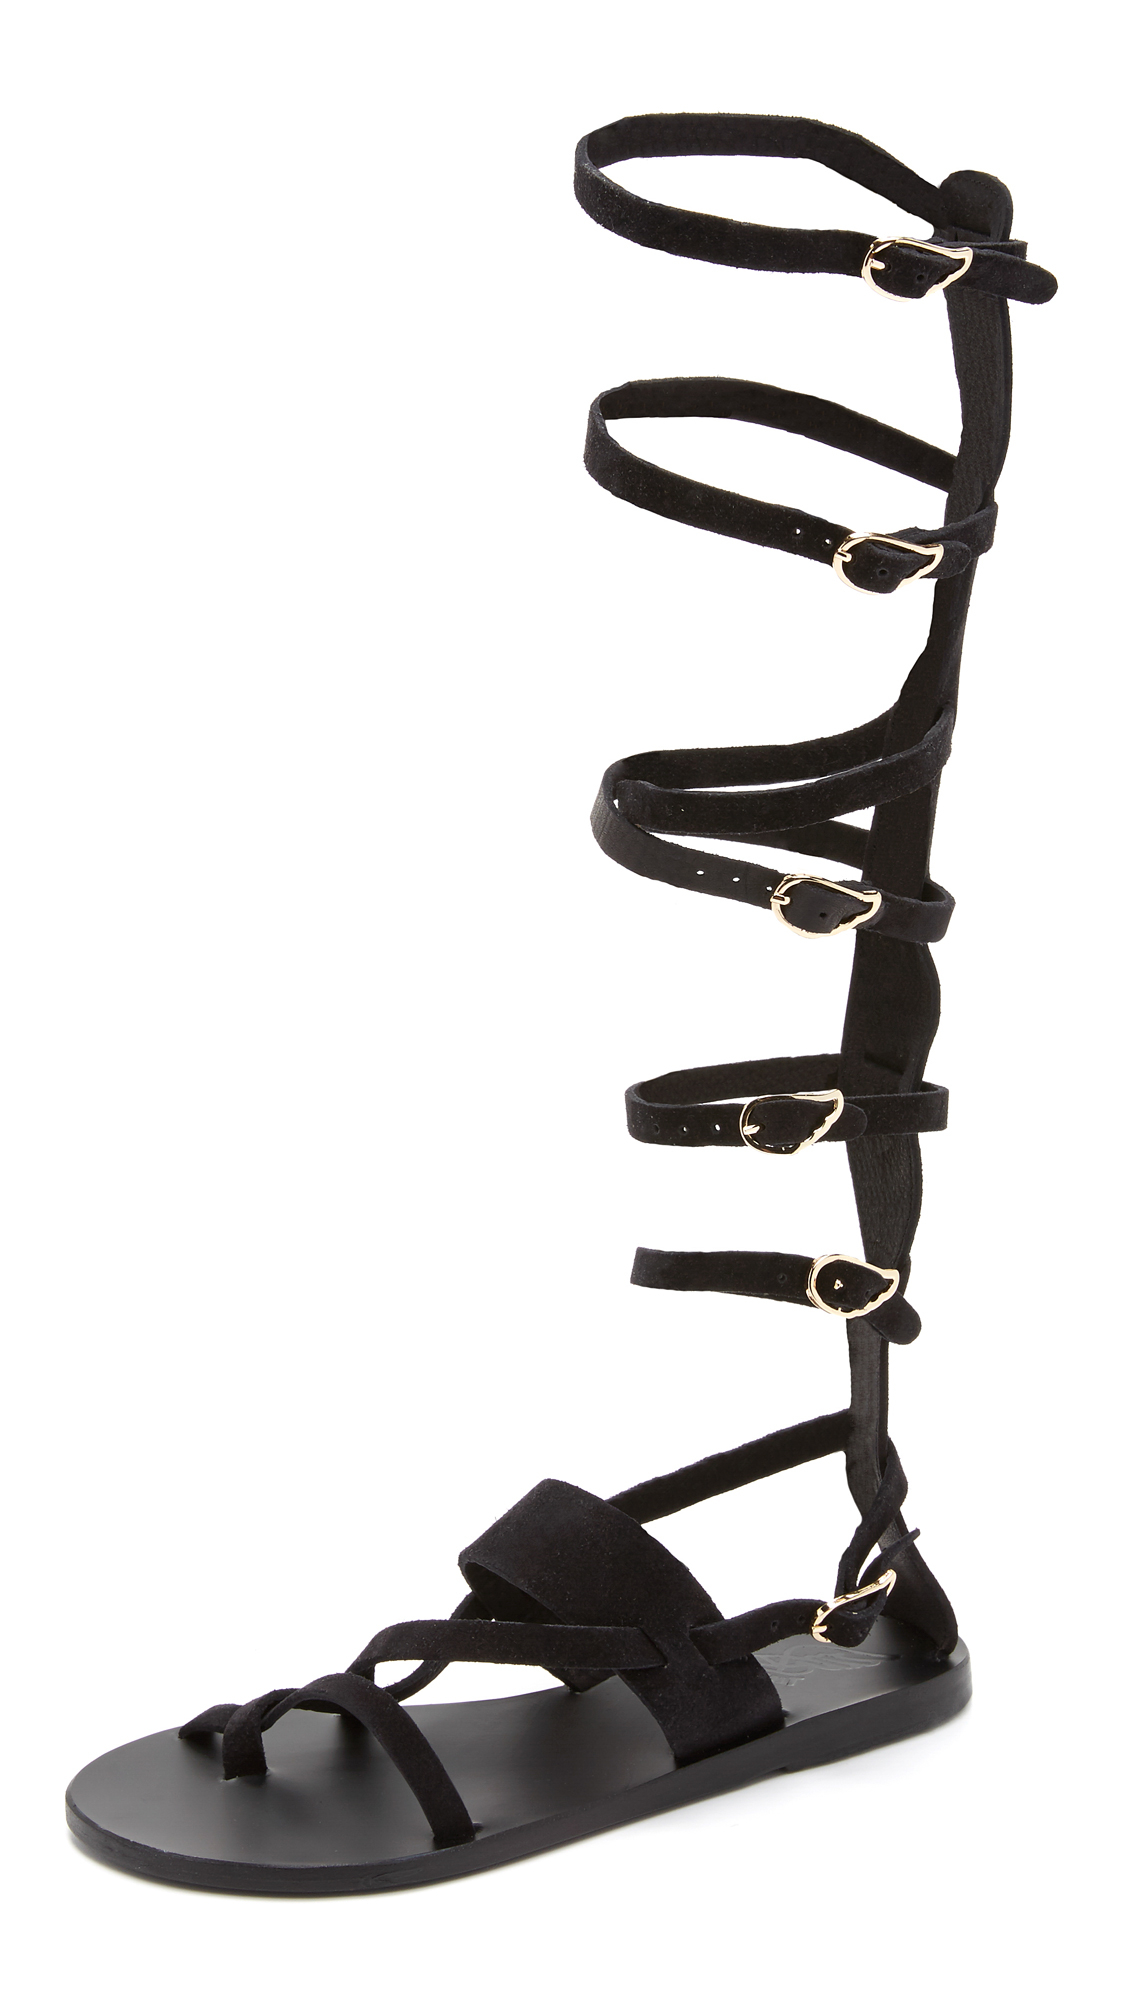 Lyst Black In Gladiator Greek Alethea High Sandals Vn8omn0w Ancient cu1T3K5lFJ